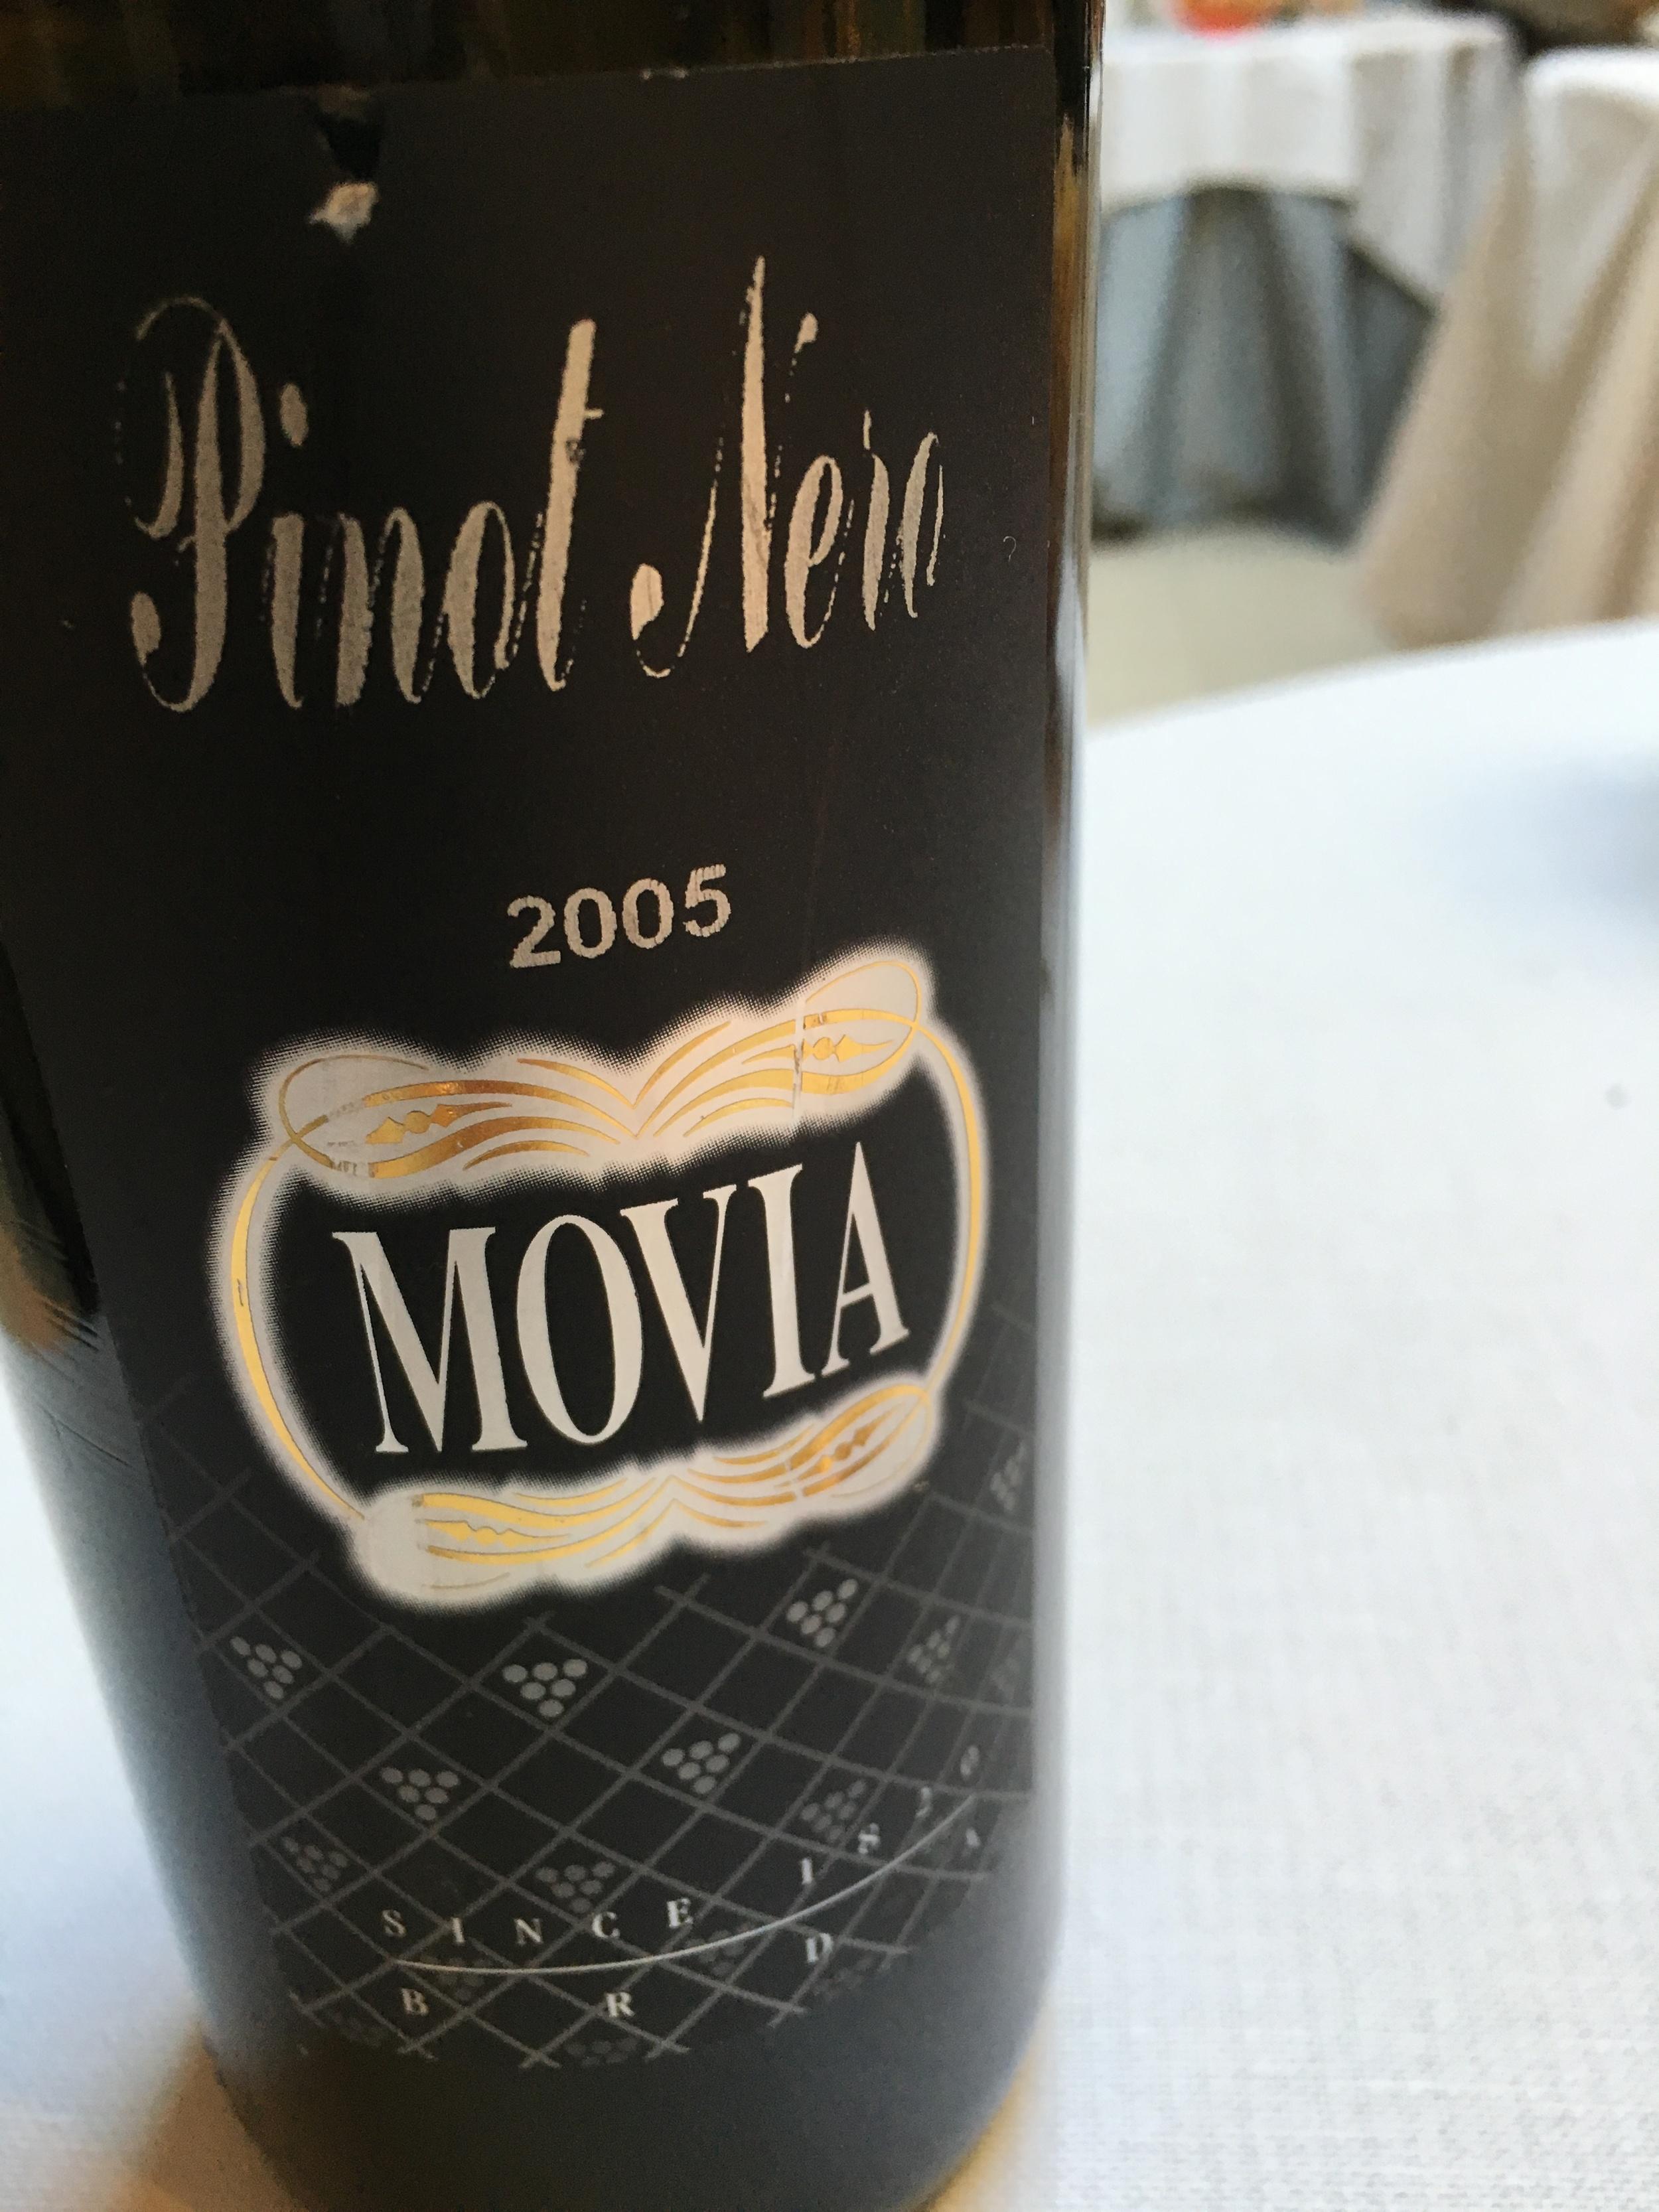 Movia 2005 Slovenian Pinot Noir